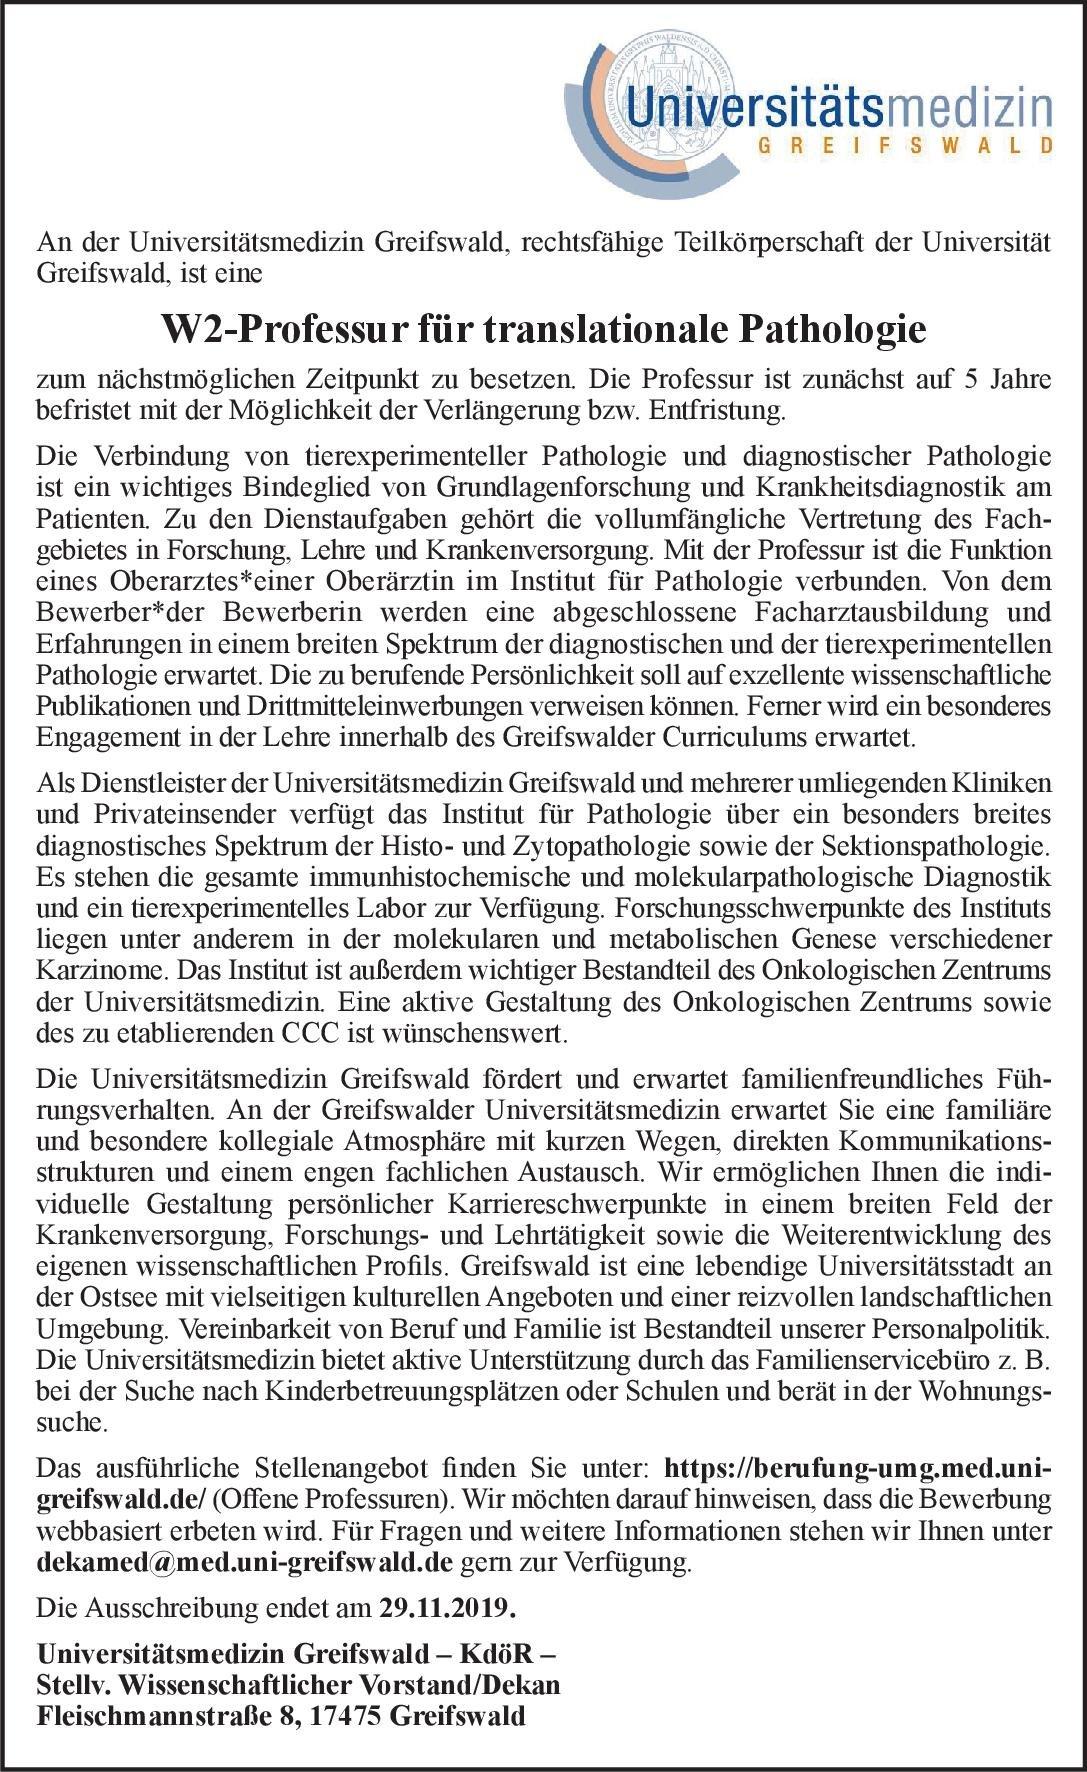 Universitätsmedizin Greifswald W2-Professur für translationale Pathologie  Pathologie Professor